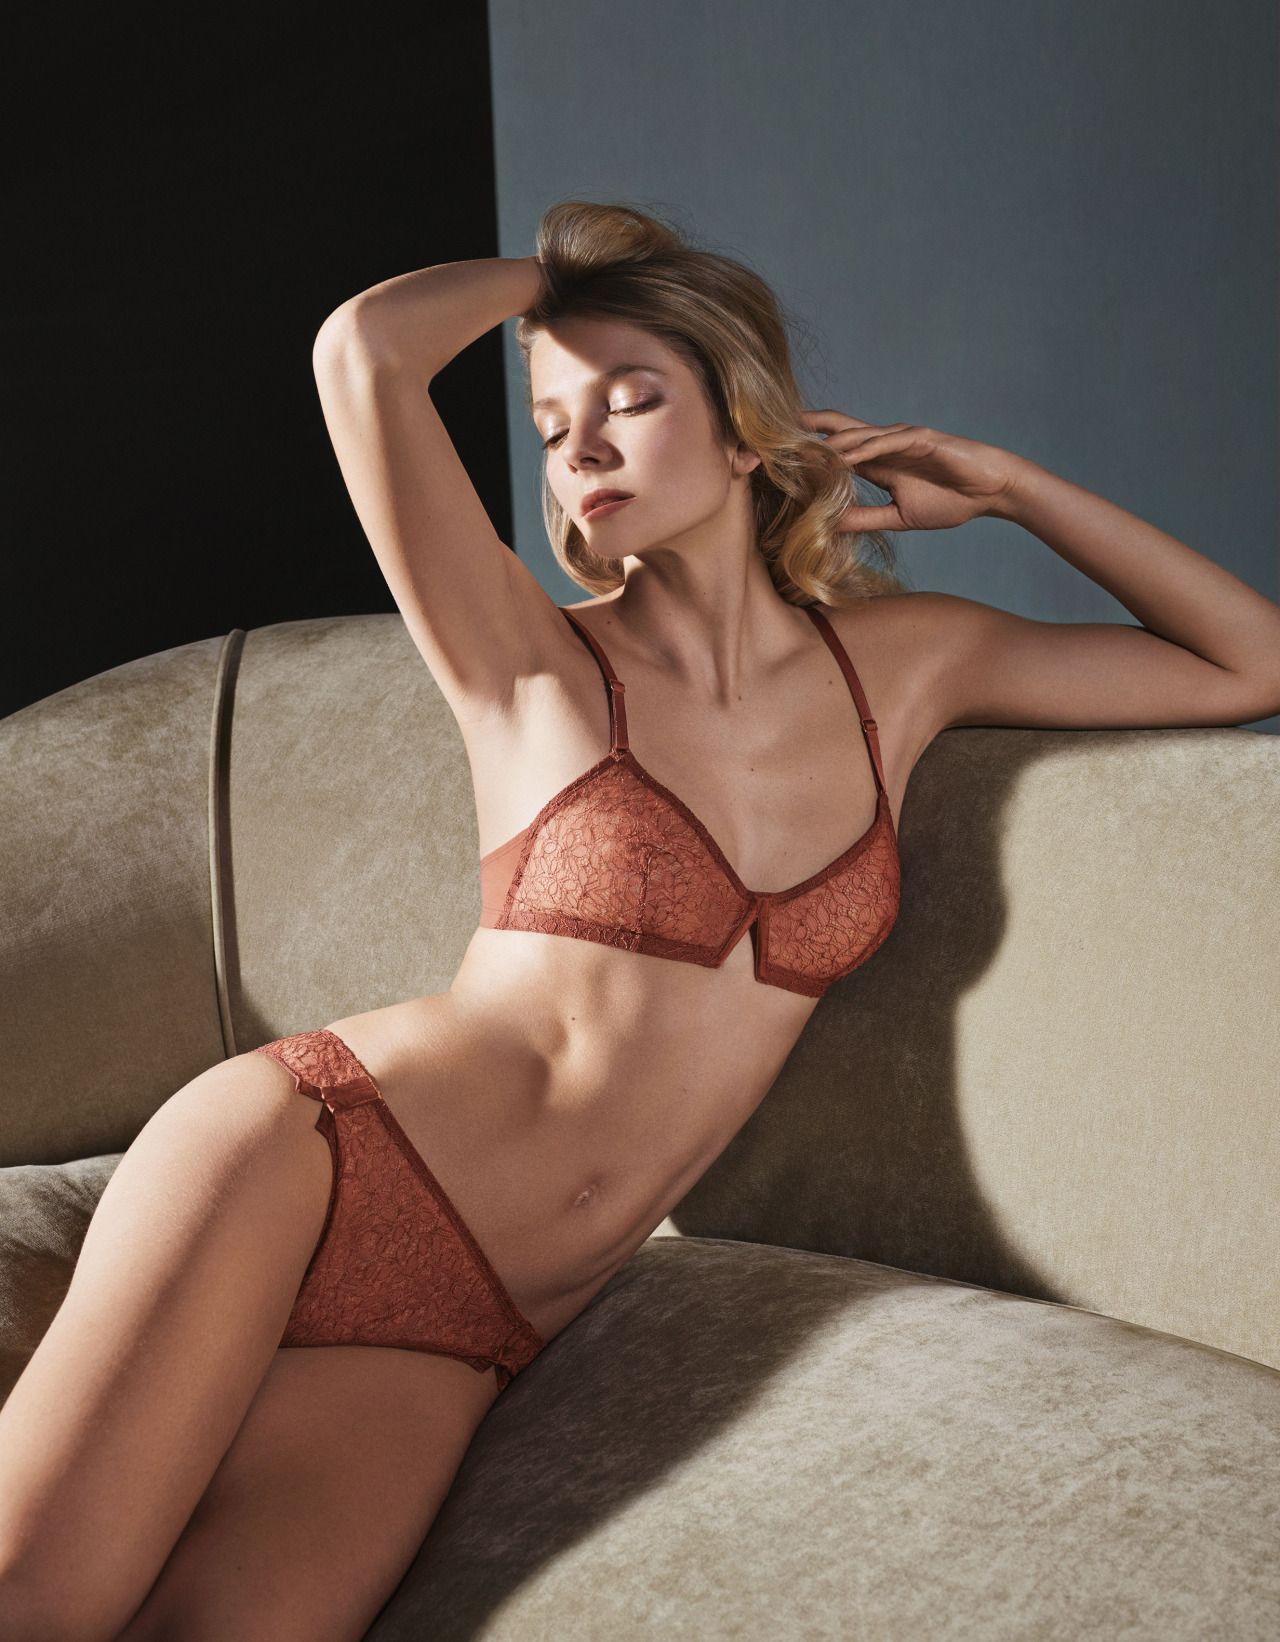 Eniko mihalik sexy 2 new photos new pics